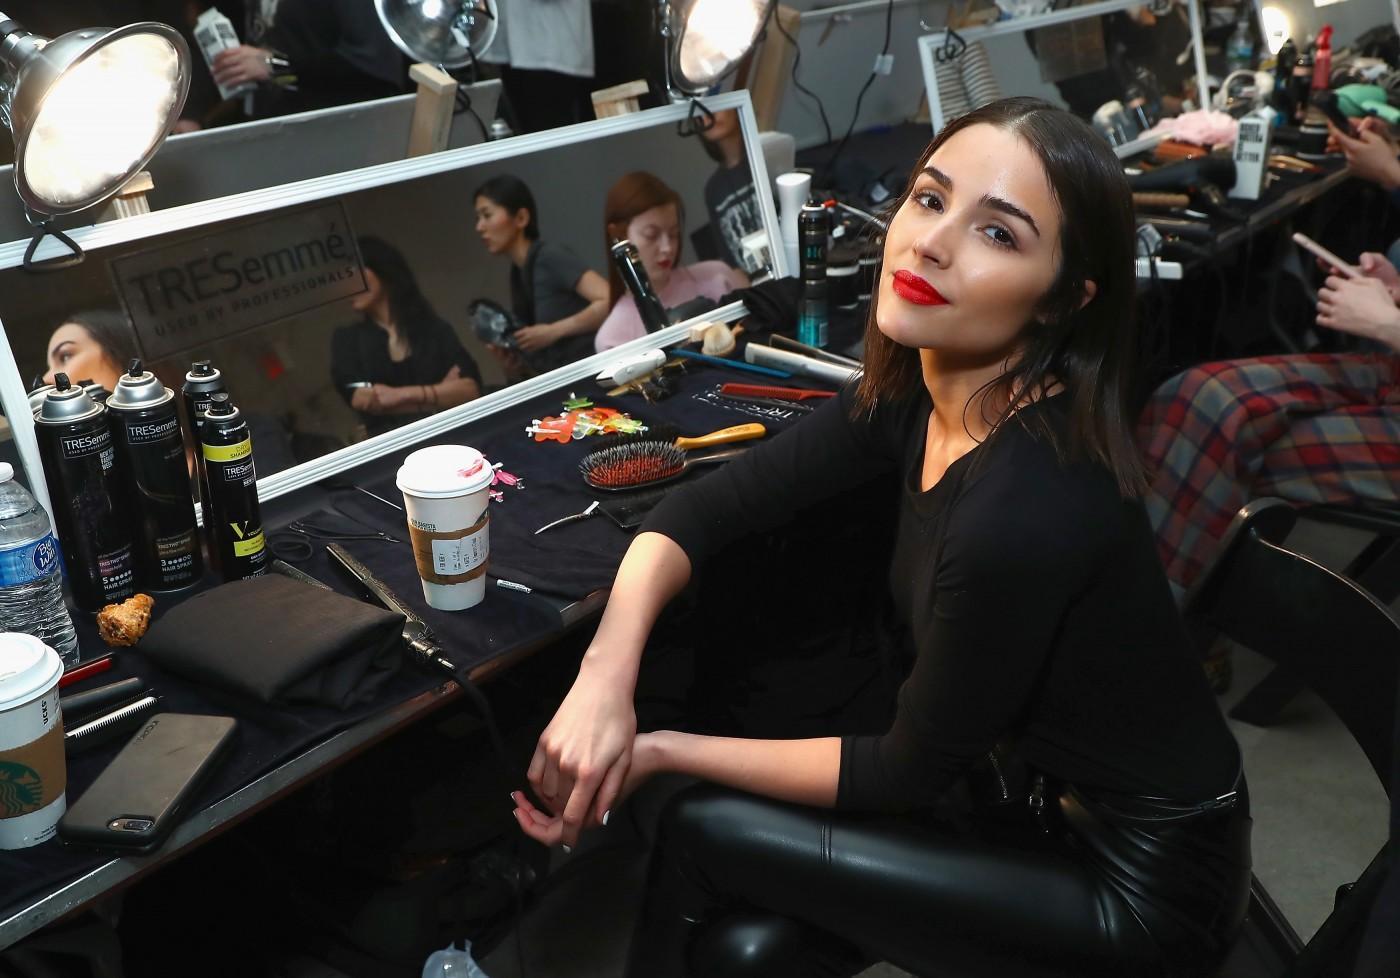 Santana cara joey maalouf partner glam app, Necklaces collar